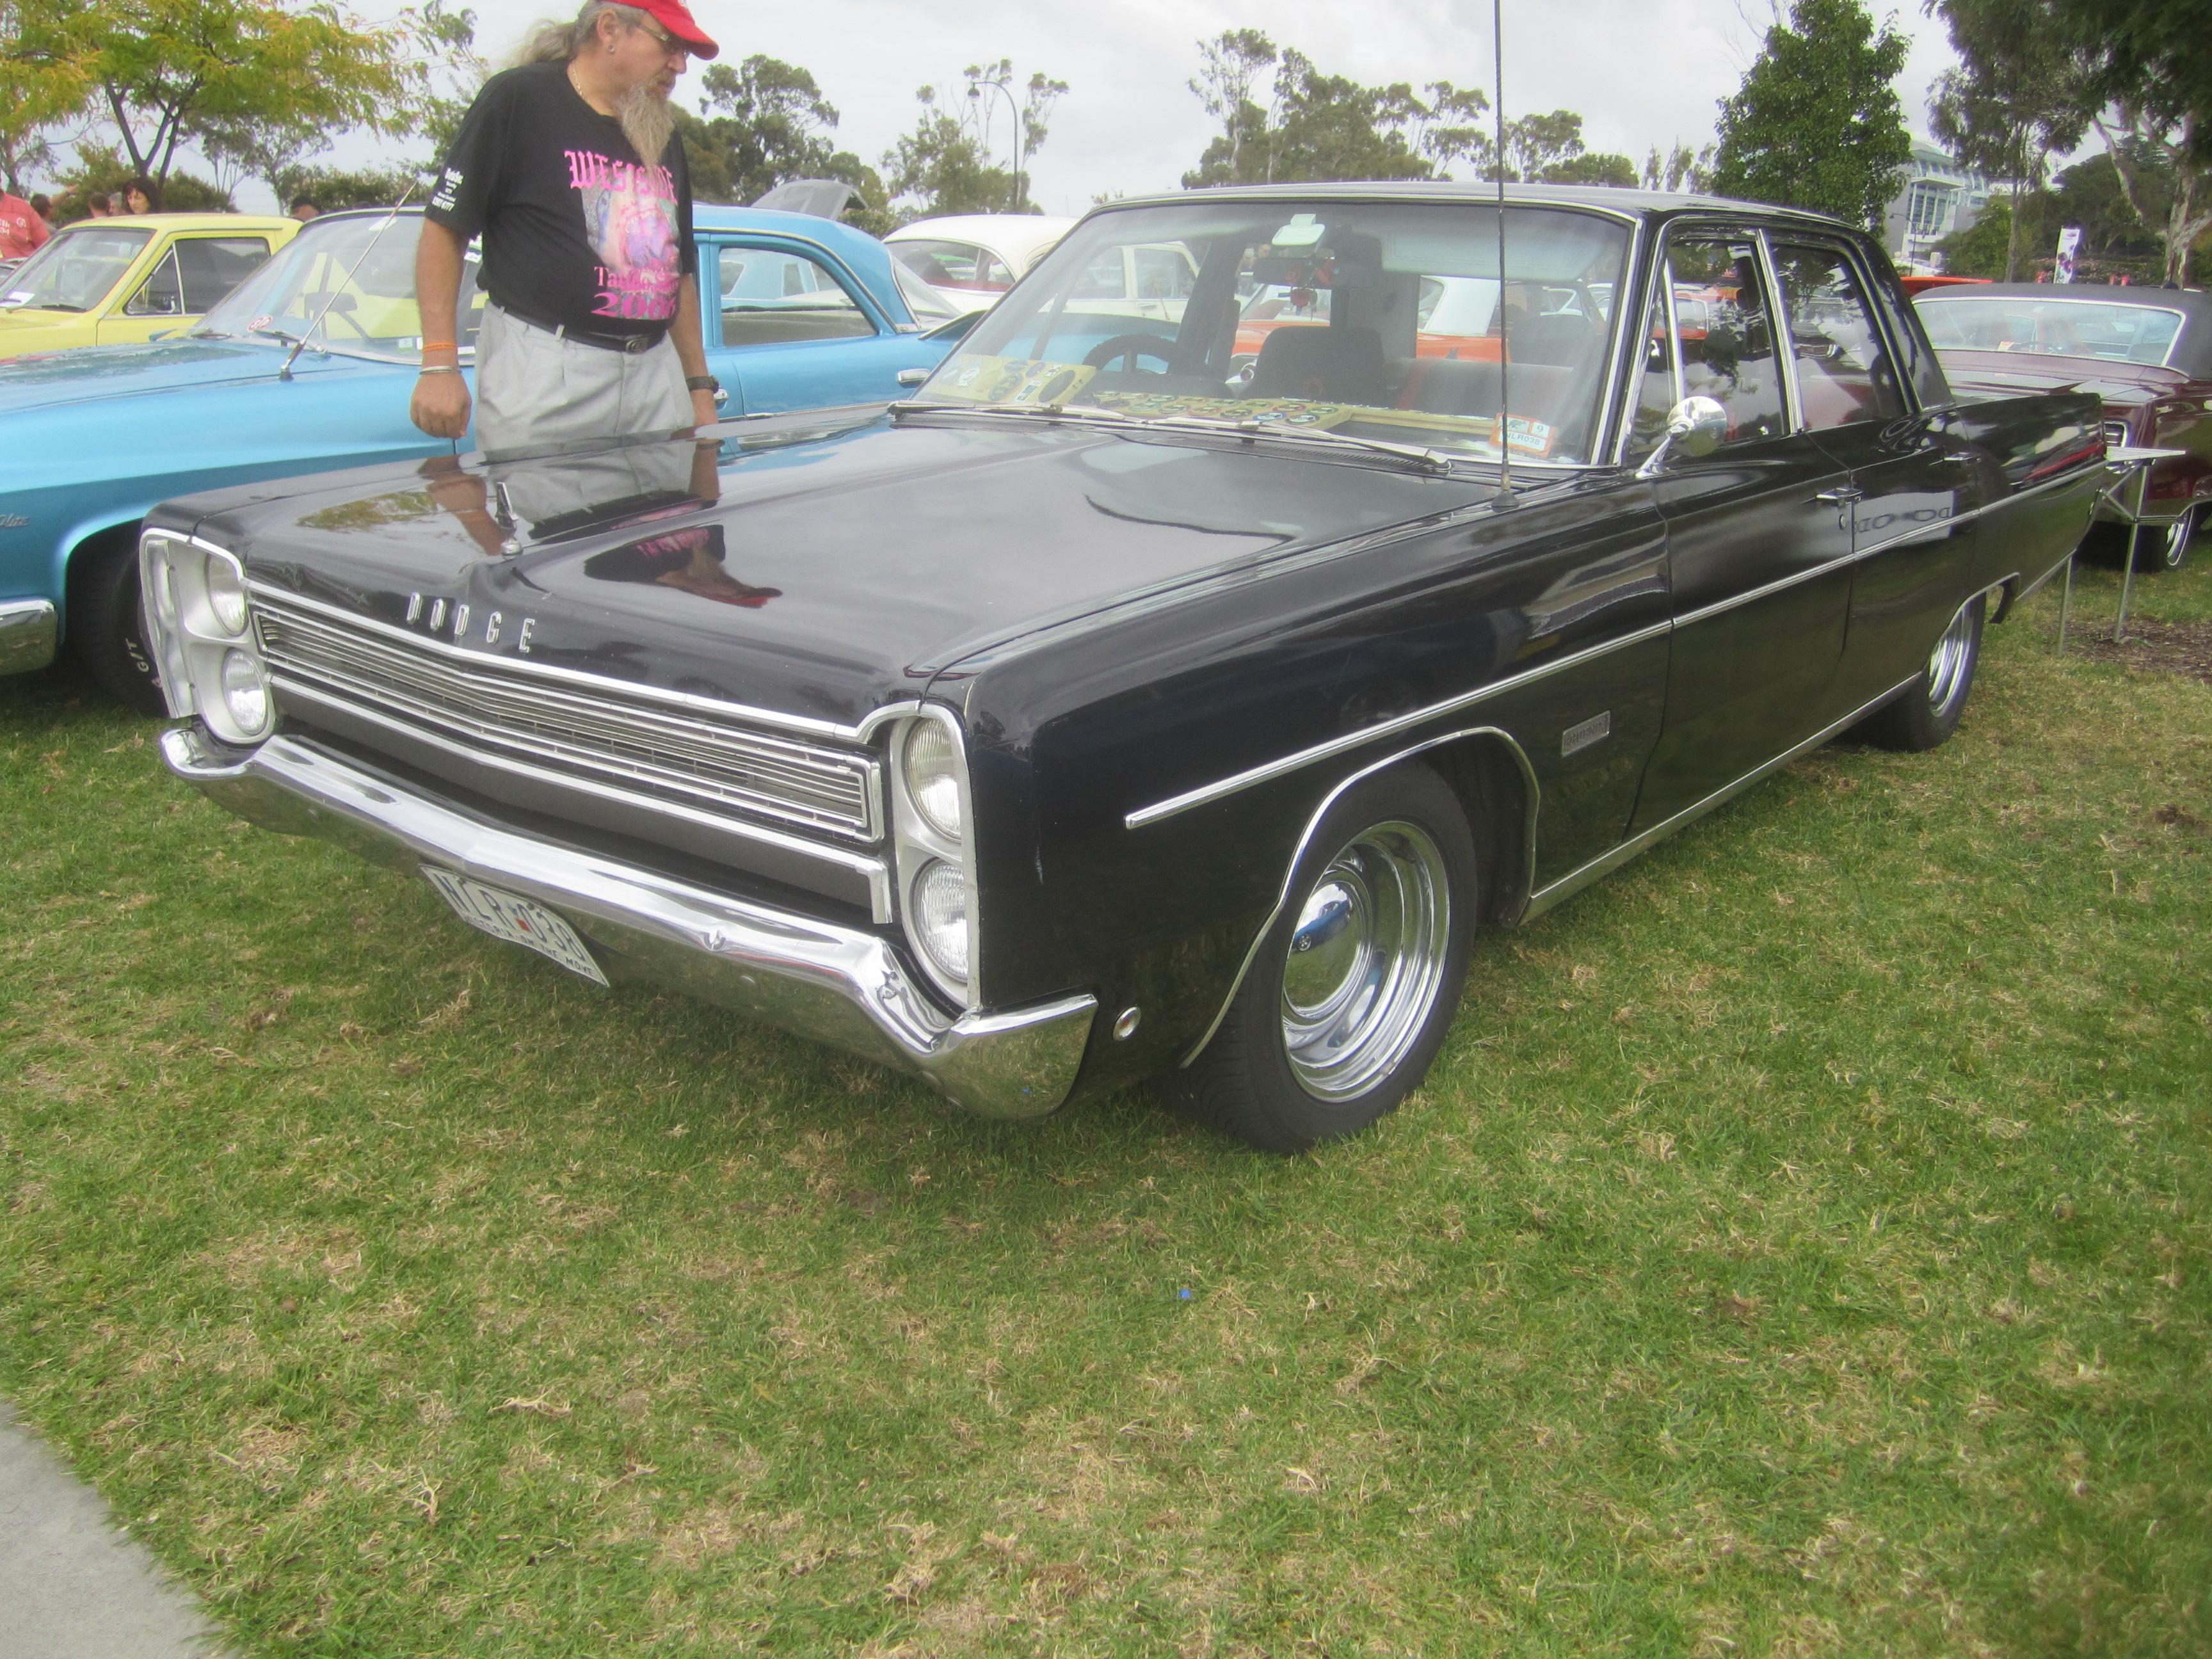 File:1968 Dodge Phoenix Sedan.jpg - Wikimedia Commons